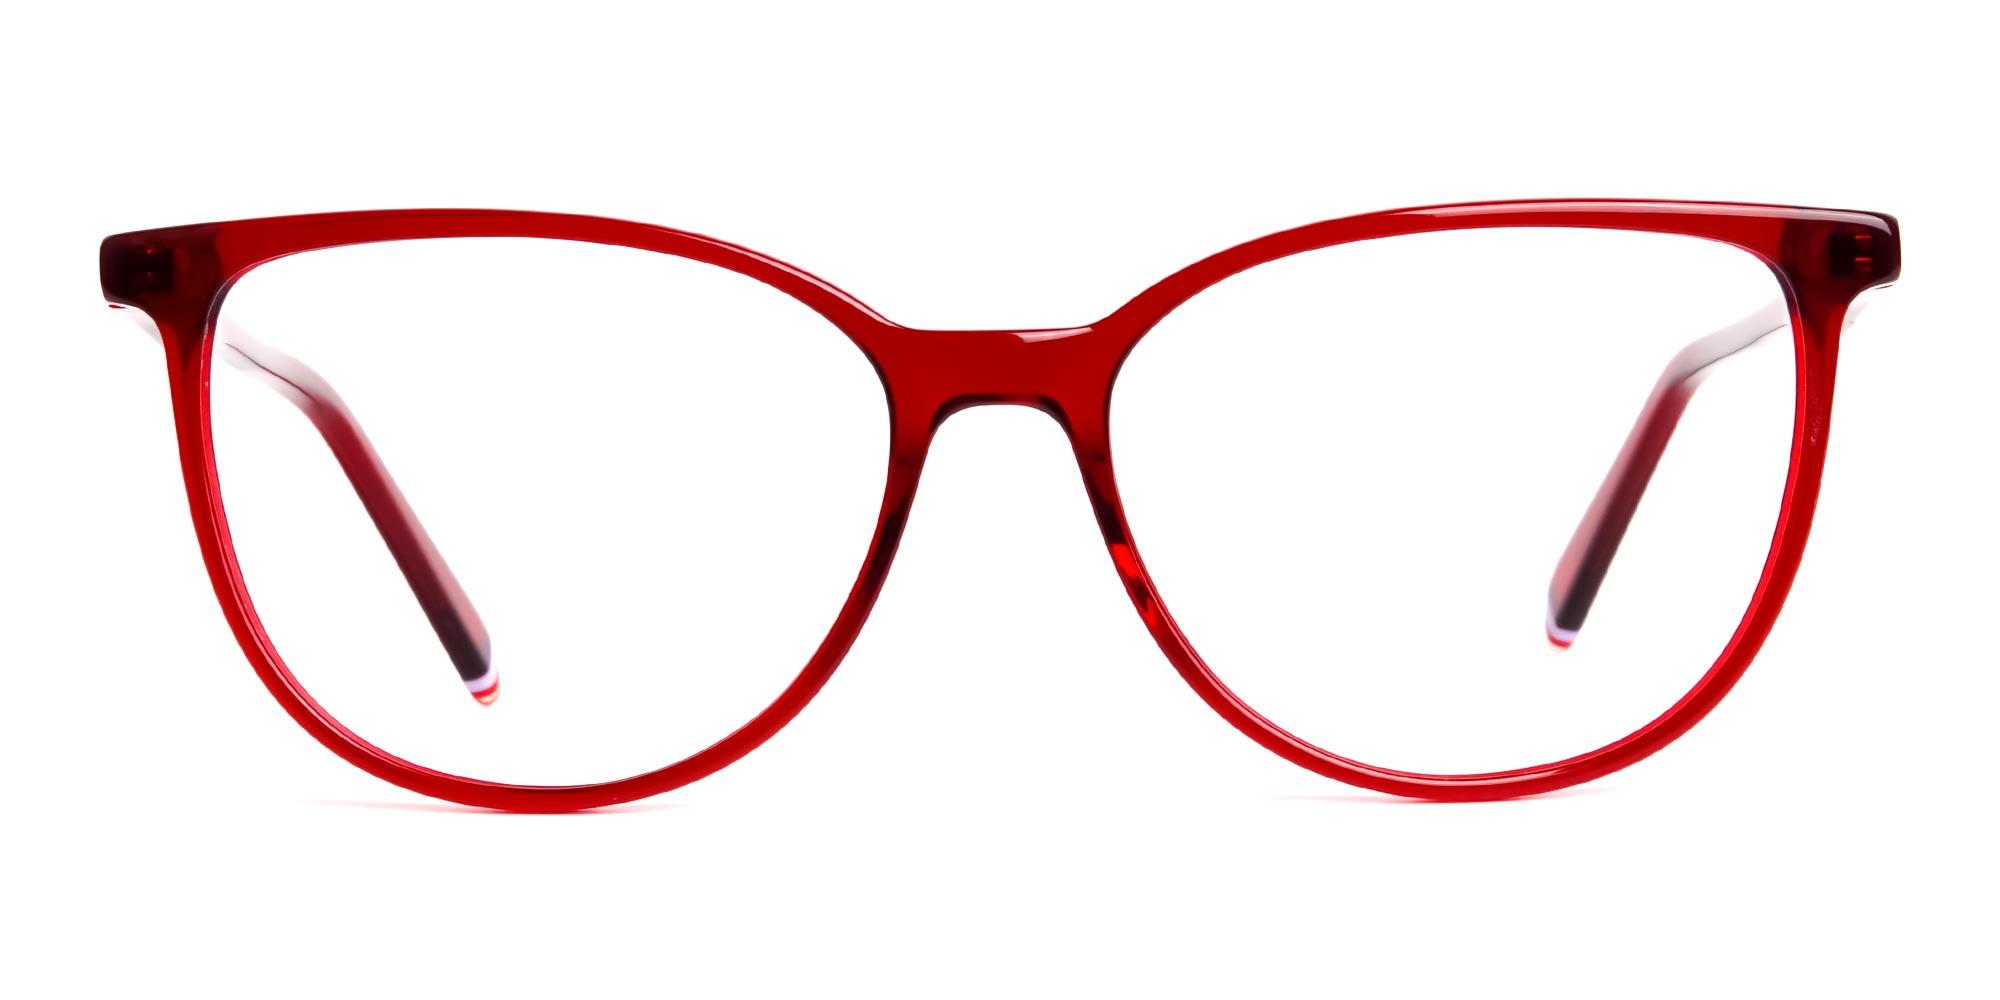 Dark Red Translucent Cat eye Glasses